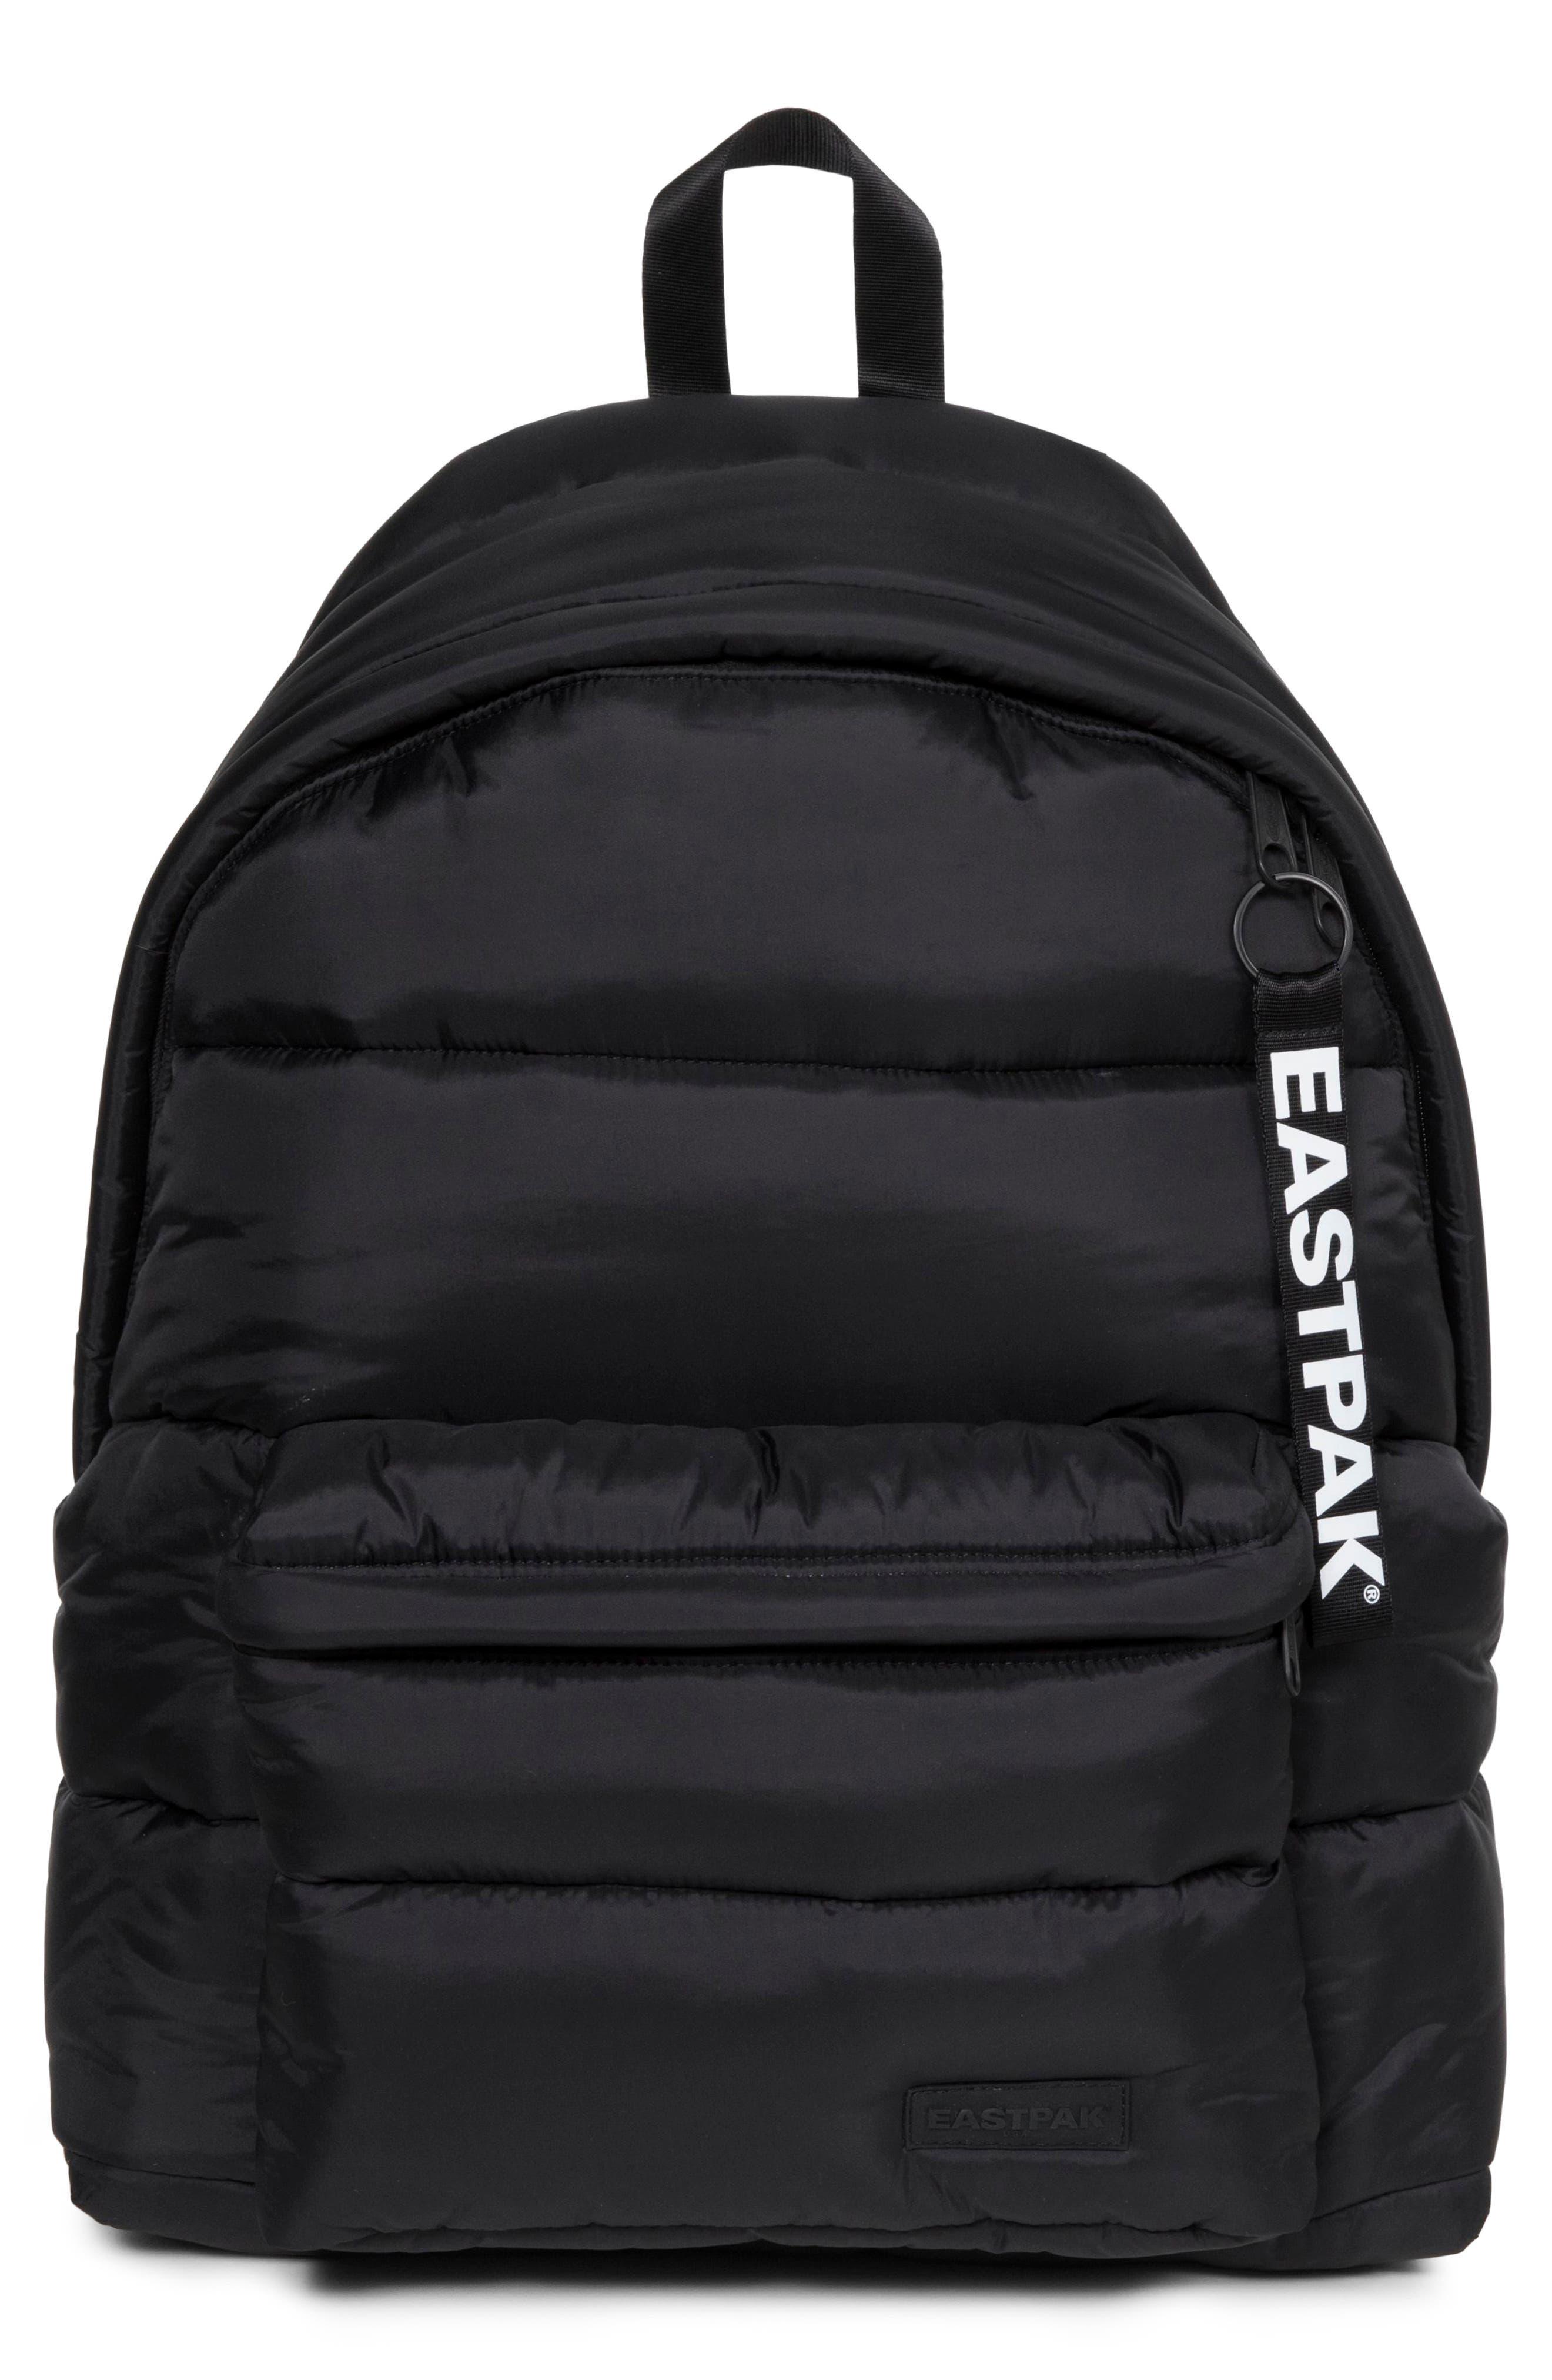 Eastpak Xx-Large Padded Puffer Backpack -